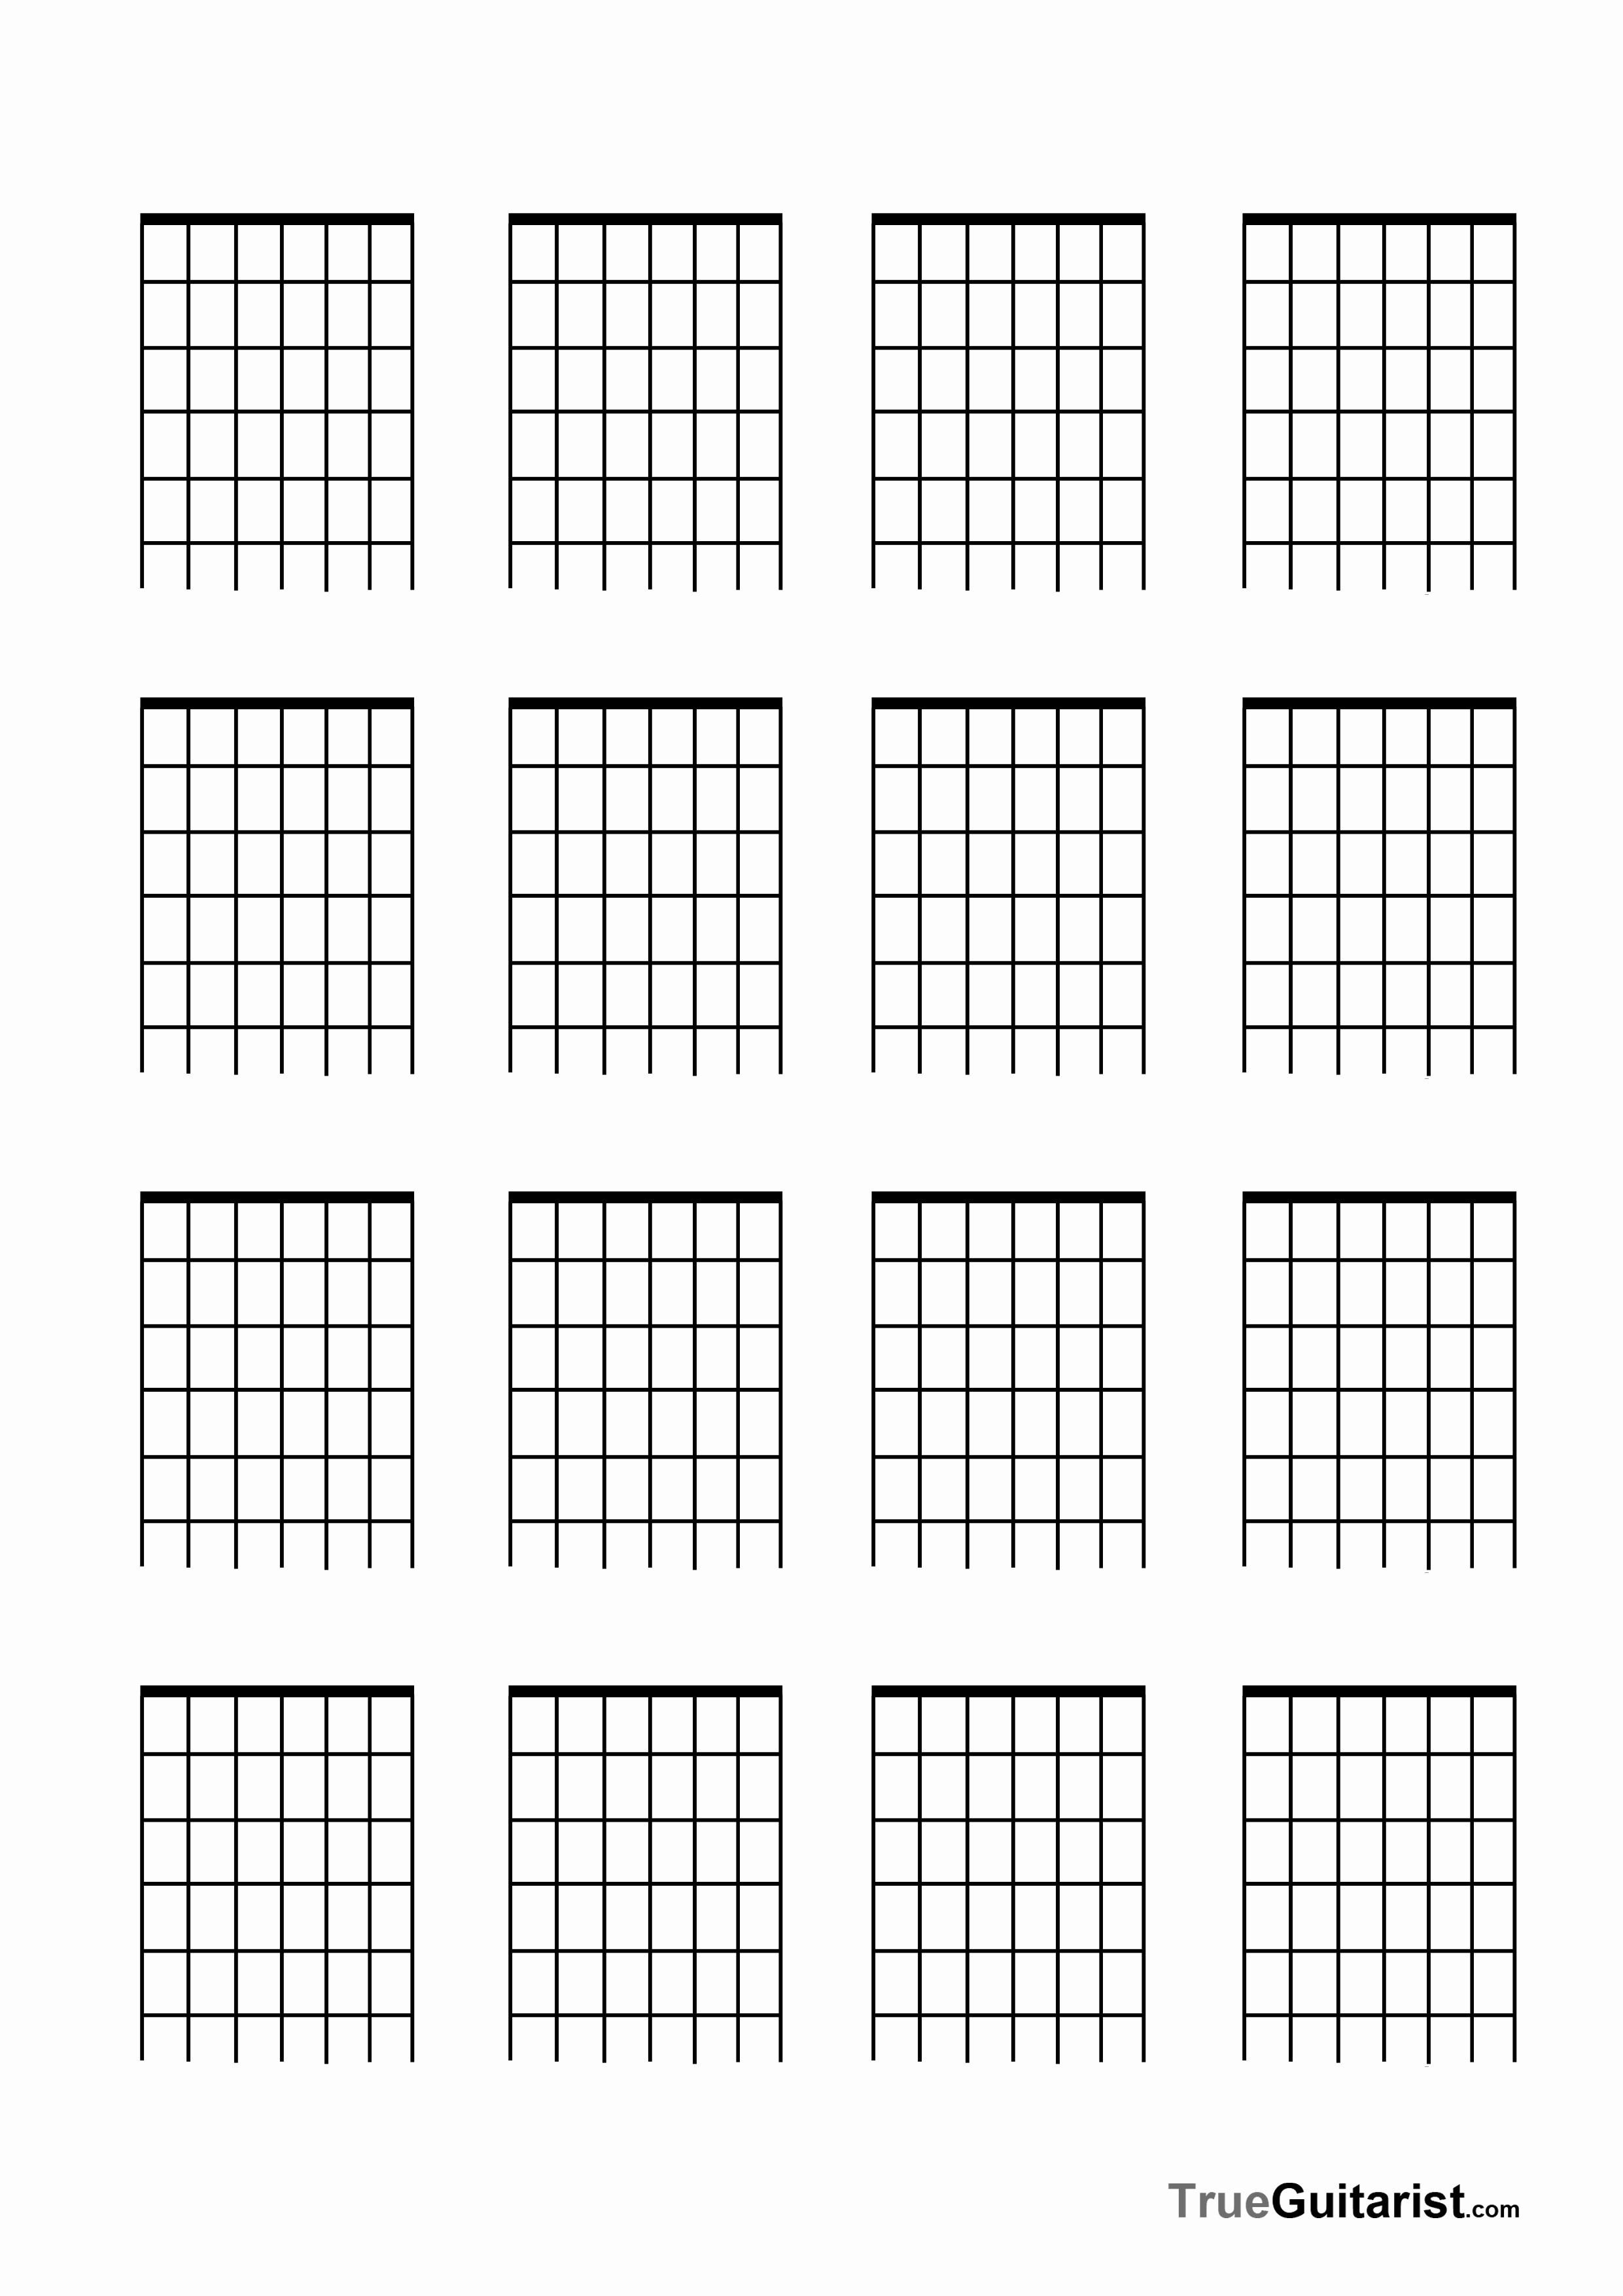 Blank Guitar Chord Chart | Accomplice Music - Free Printable Blank Guitar Chord Charts